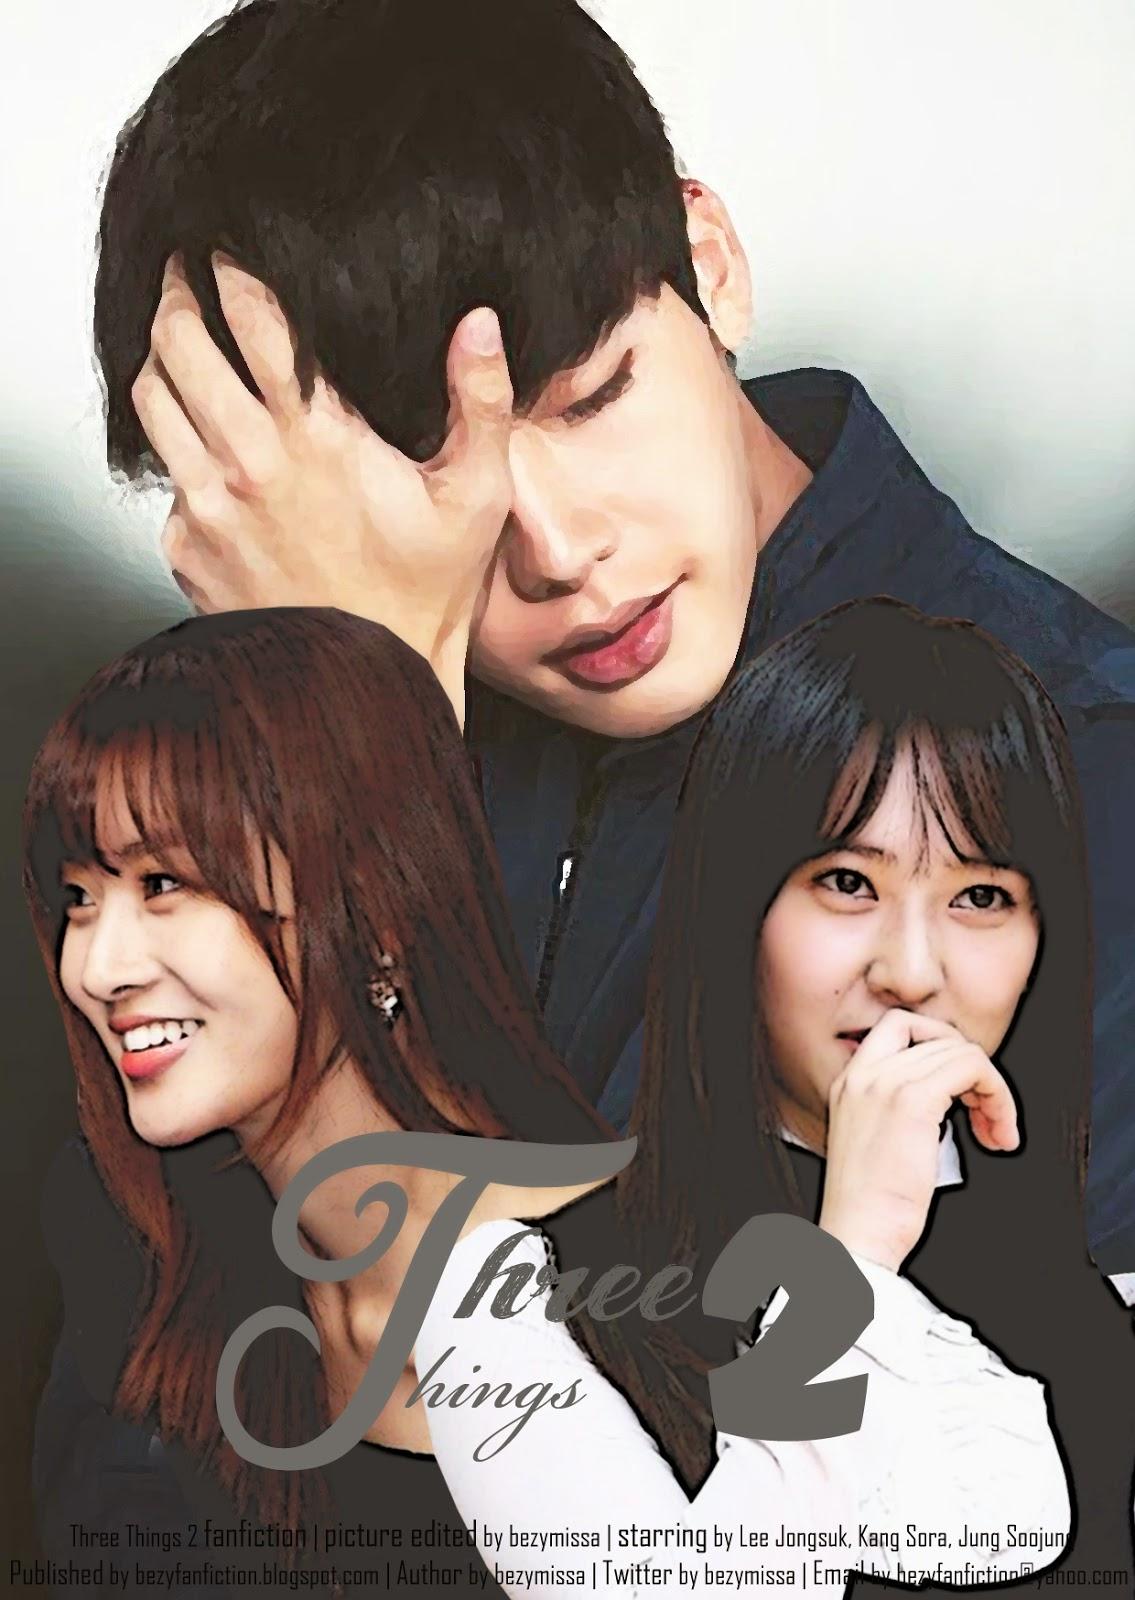 ♥Quack Couple♥Park Hoon(Lee Jong Suk) & Oh Soo Hyun(Kang